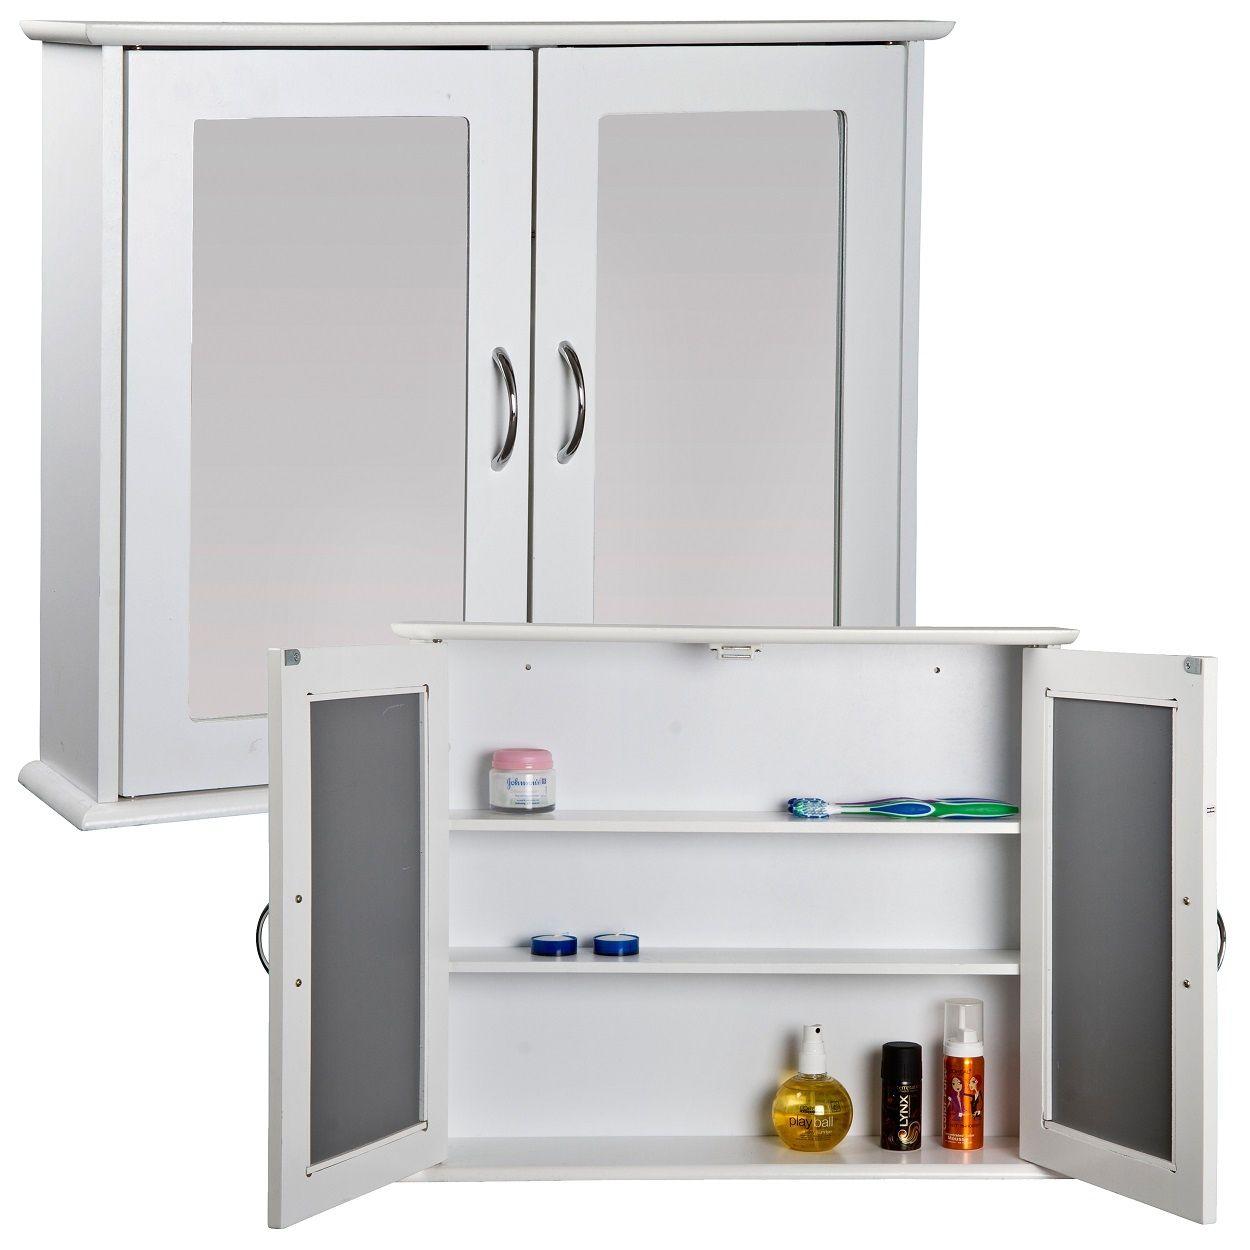 Bathroom storage mirrored cabinet | Decorating | Pinterest ...